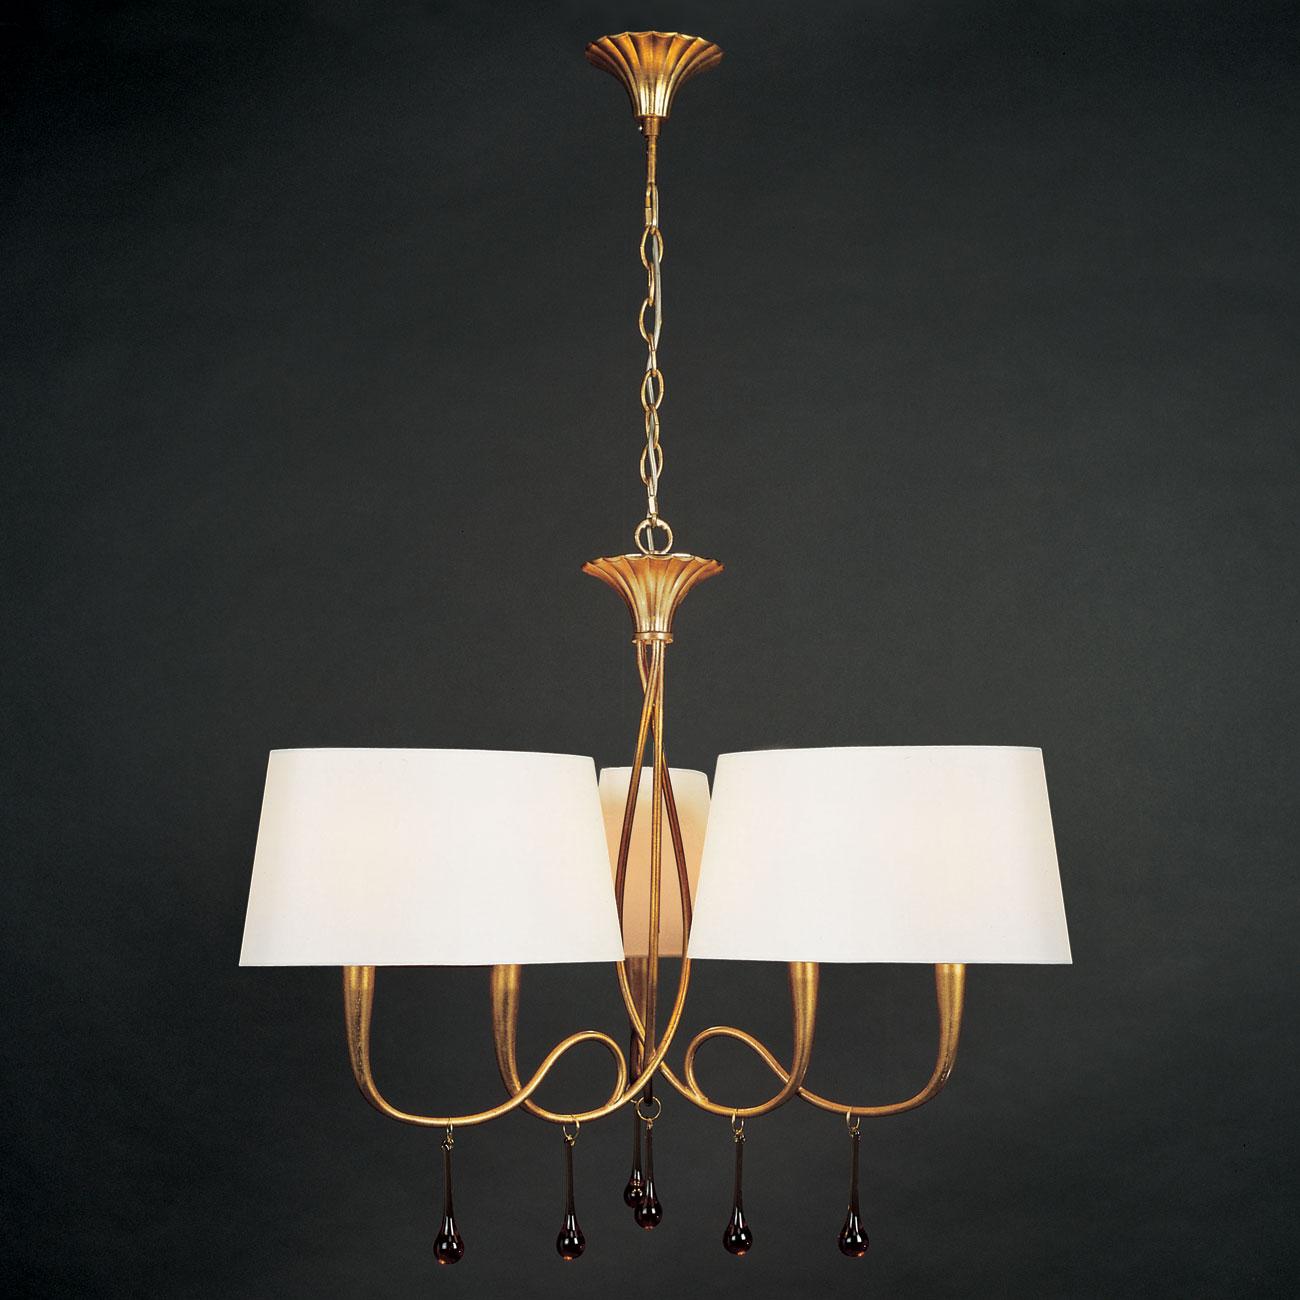 Paola Pendant Lamp 3 arms 6xE14 40w Gold